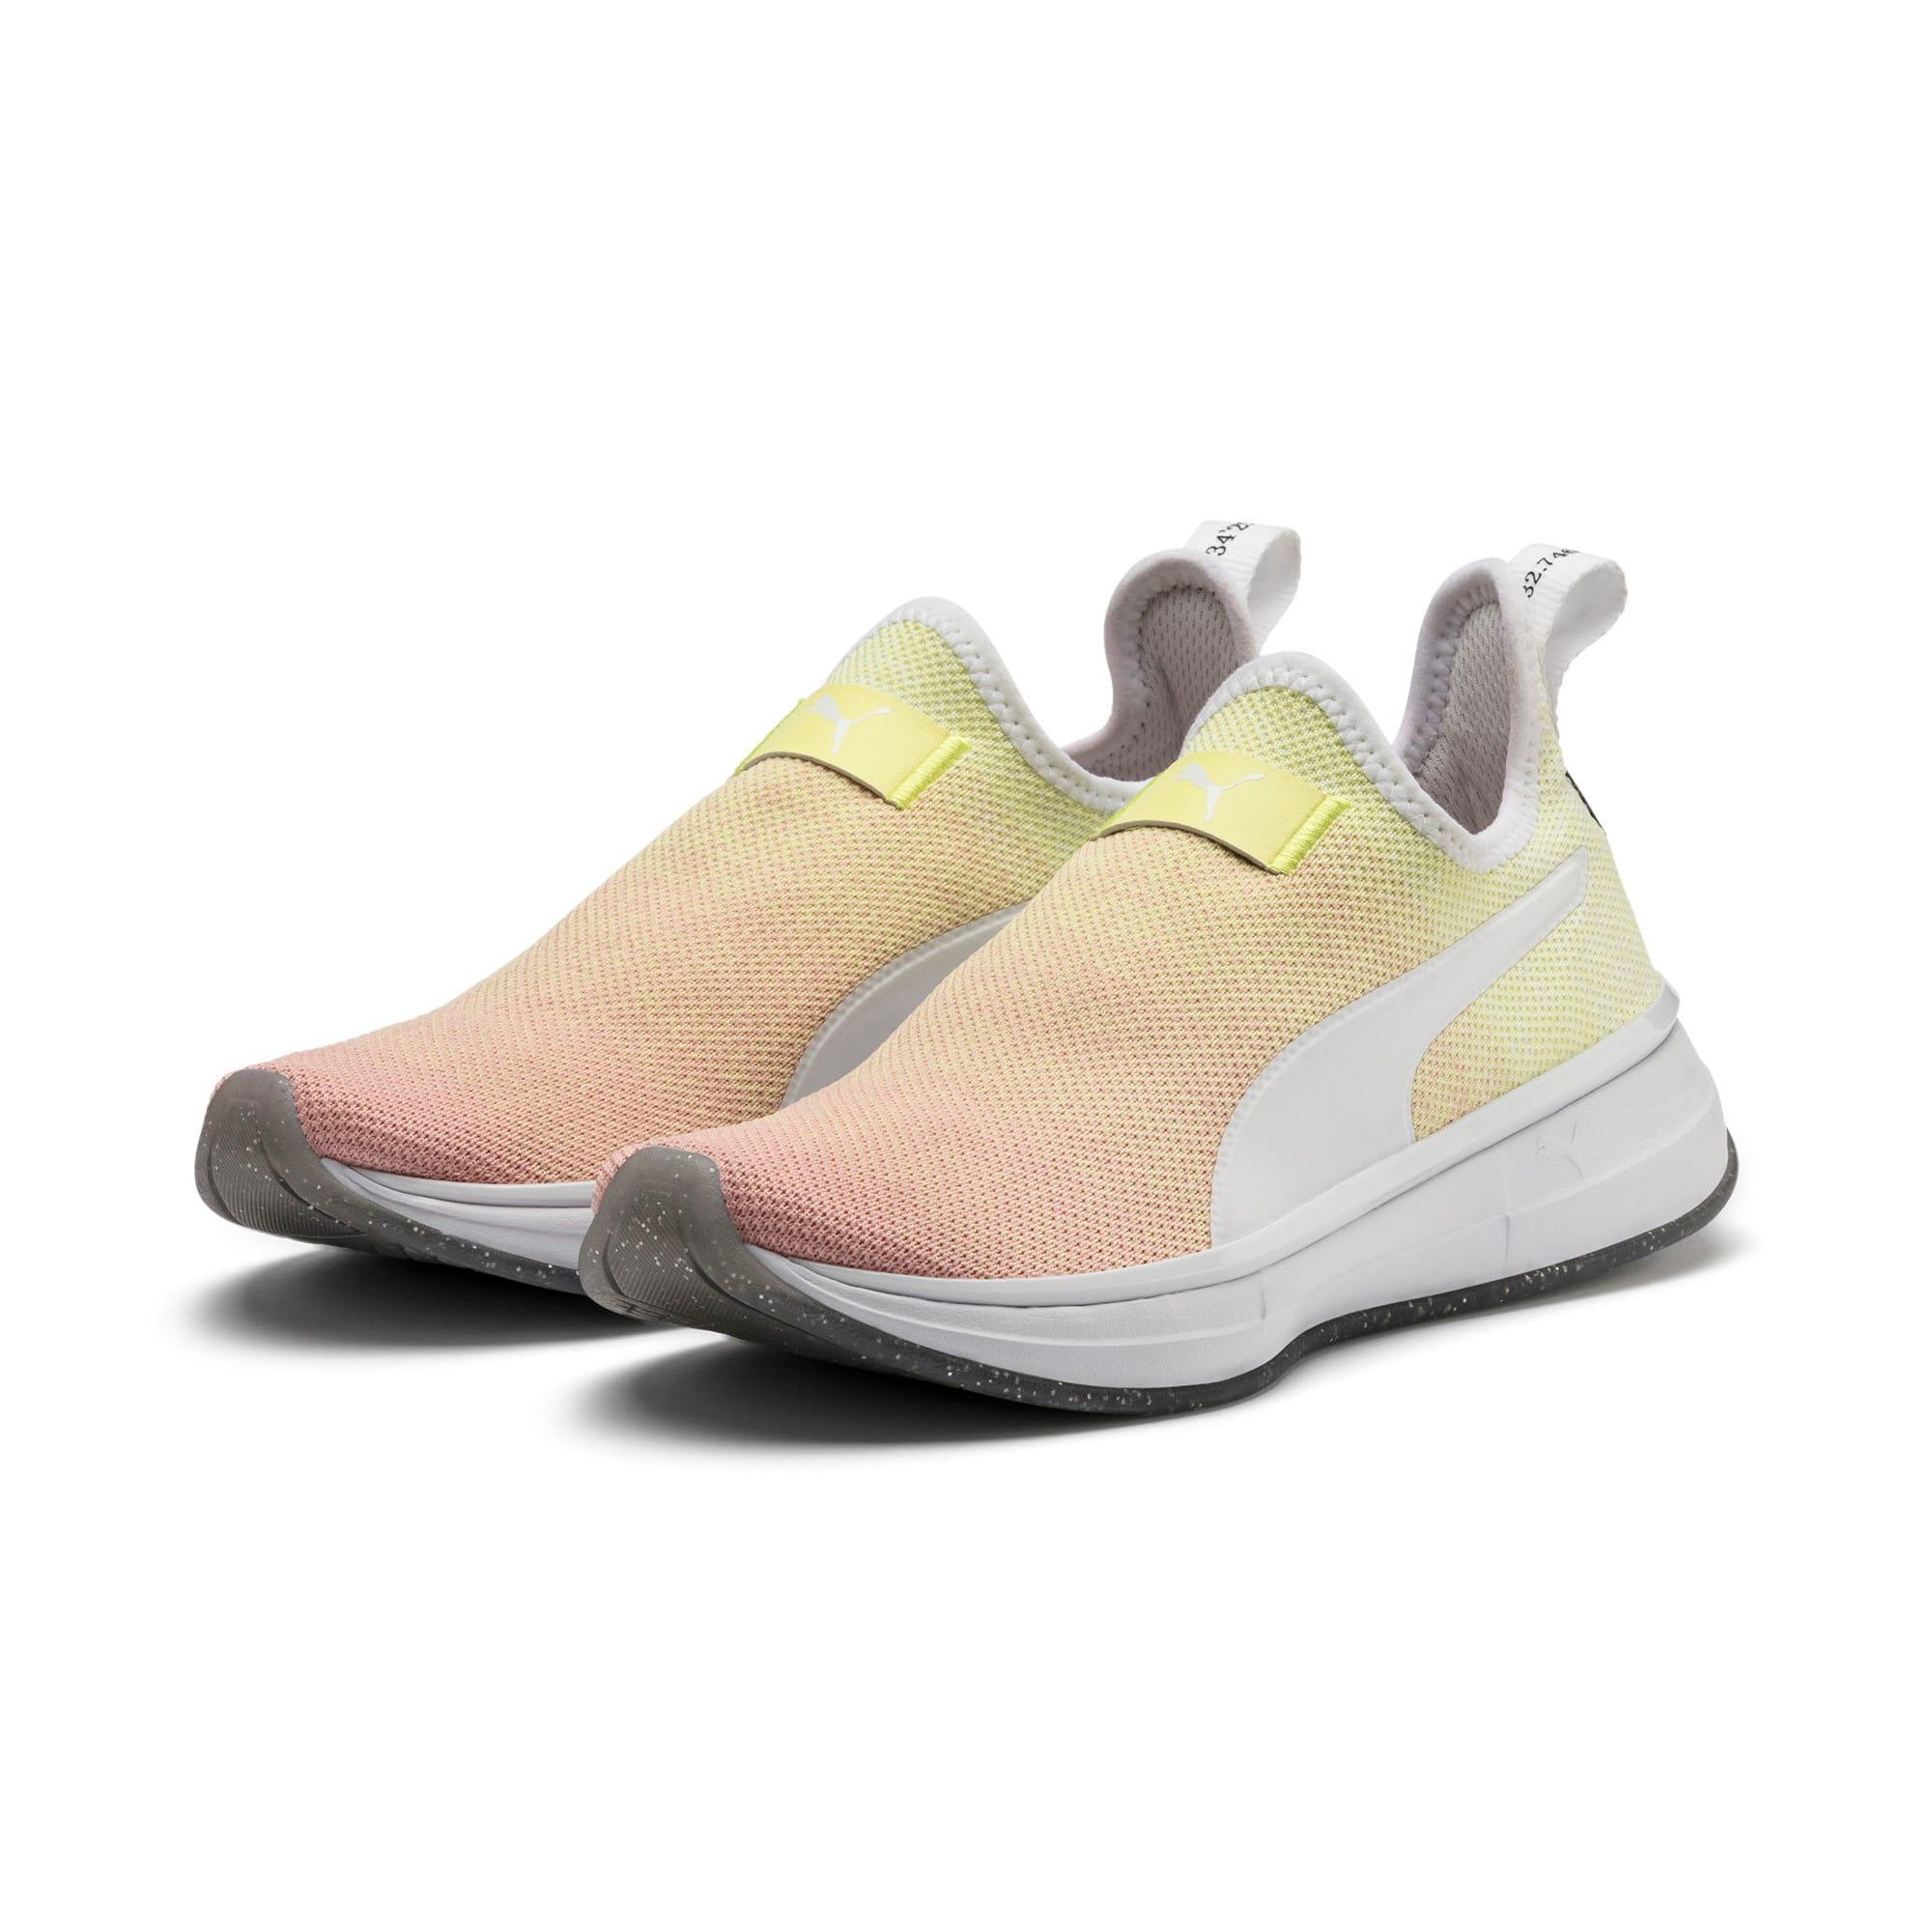 Miniatura 3 de Zapatos de entrenamiento SG Slip-On Sunrise para mujer, YELLOW-Peach Bud-White, mediano